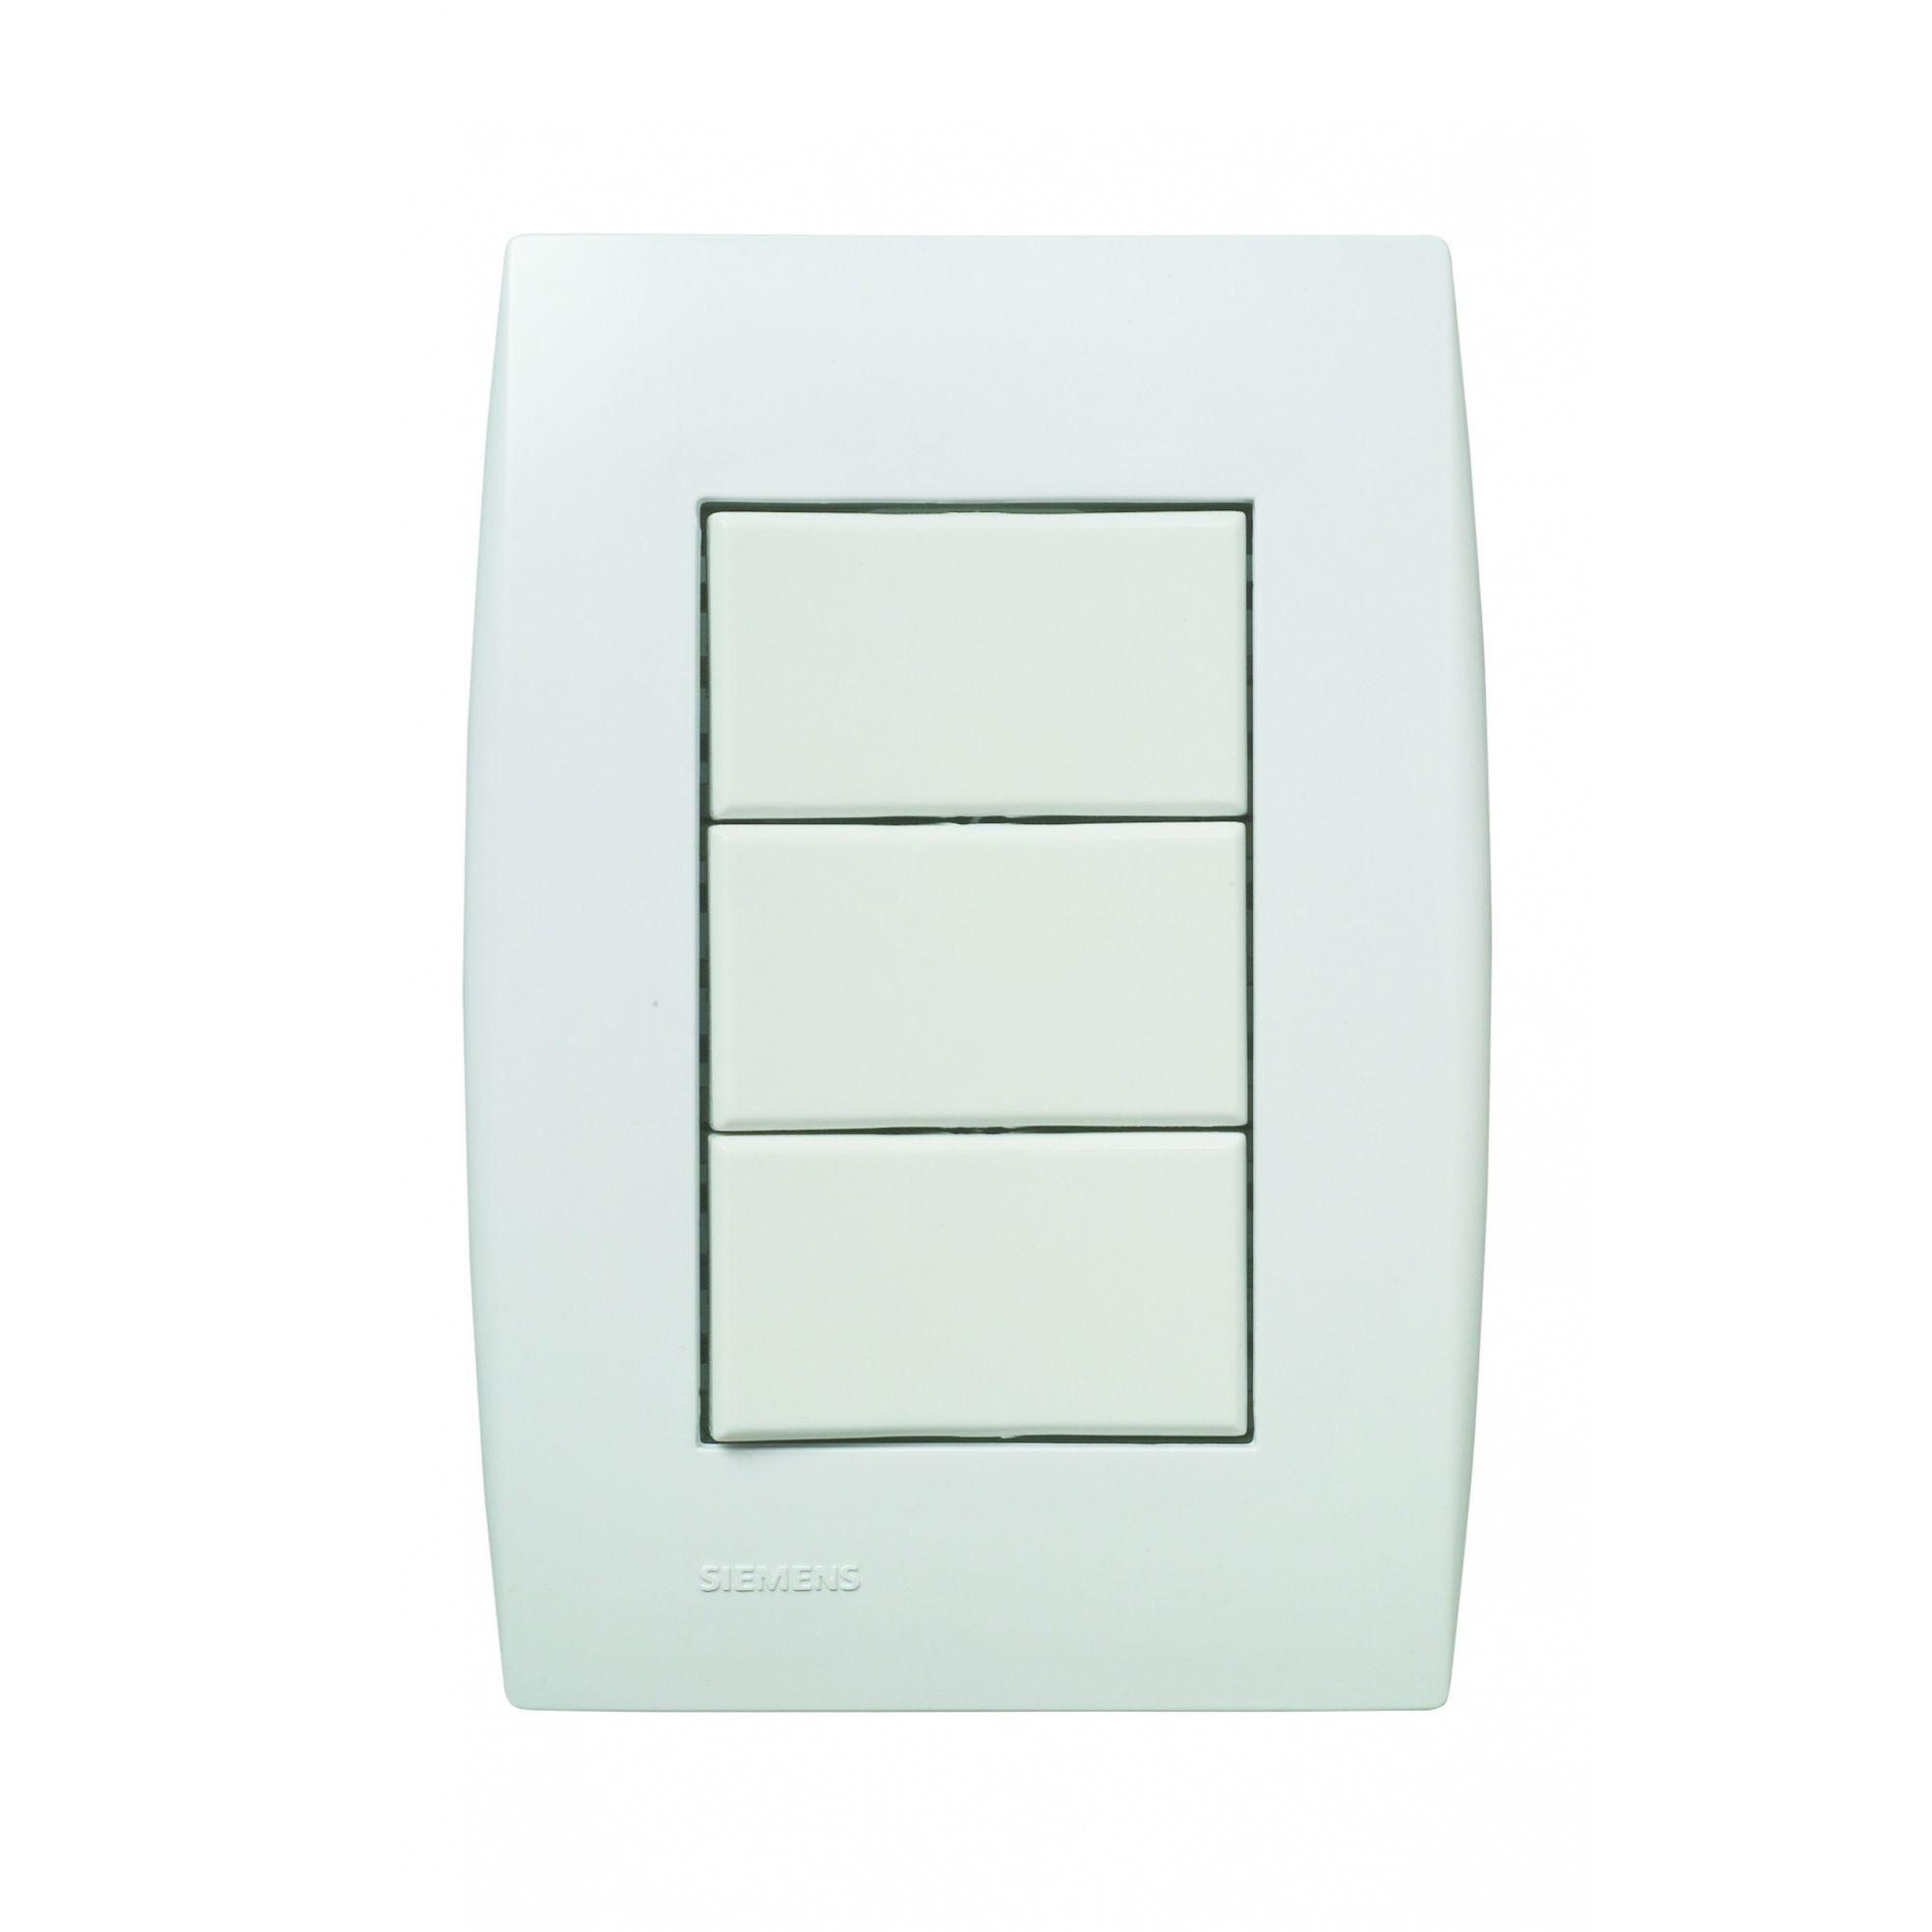 2 Interruptores Simples + 1 Interruptor Paralelo – Ilus 5TA9 9054 - Siemens